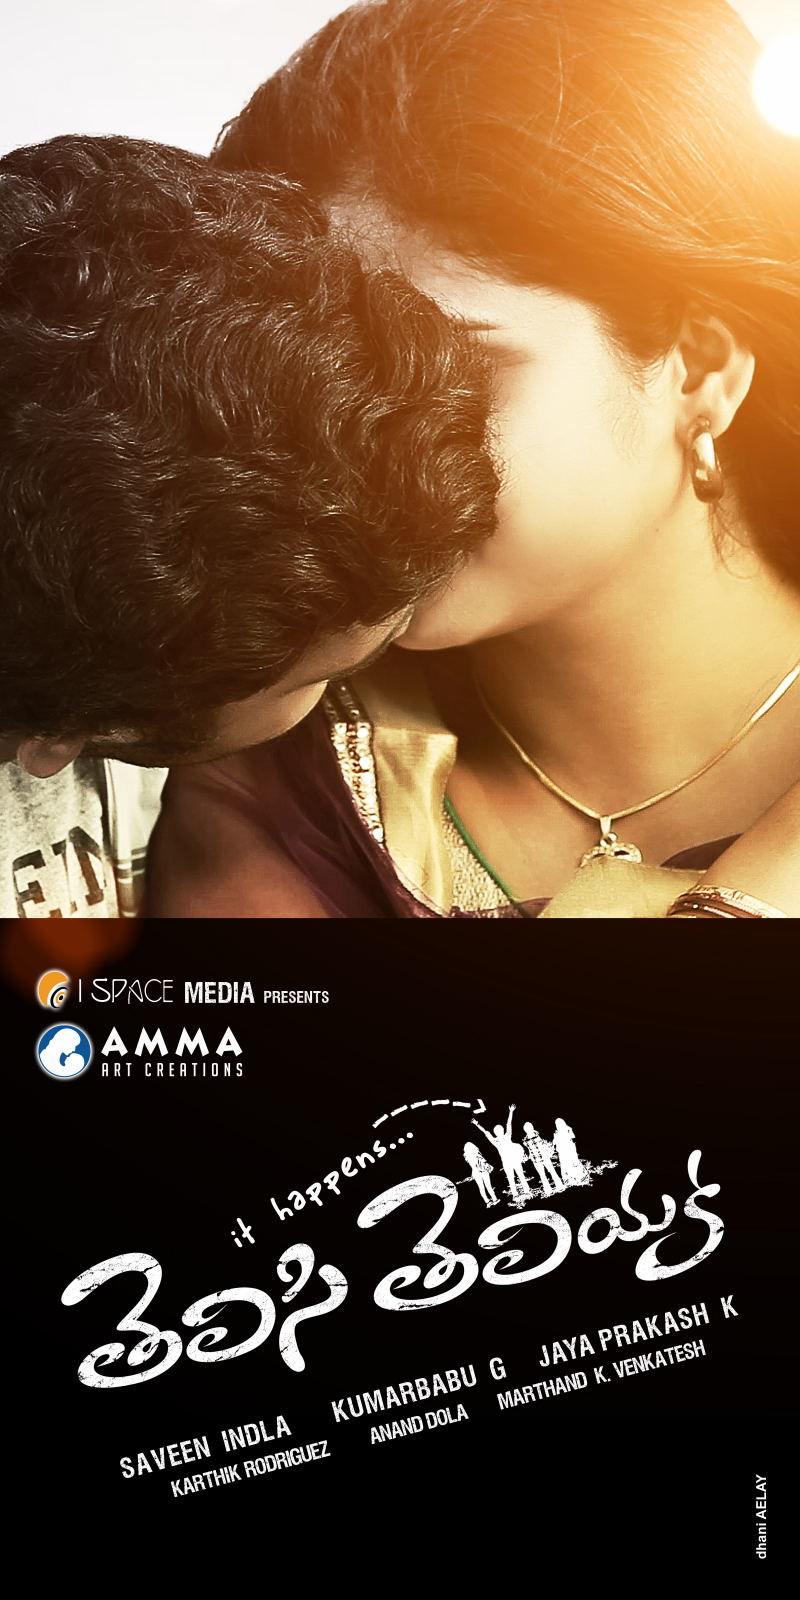 Download Abhi (2004) Movie Songs Free HQ - dl.doregama.xyz